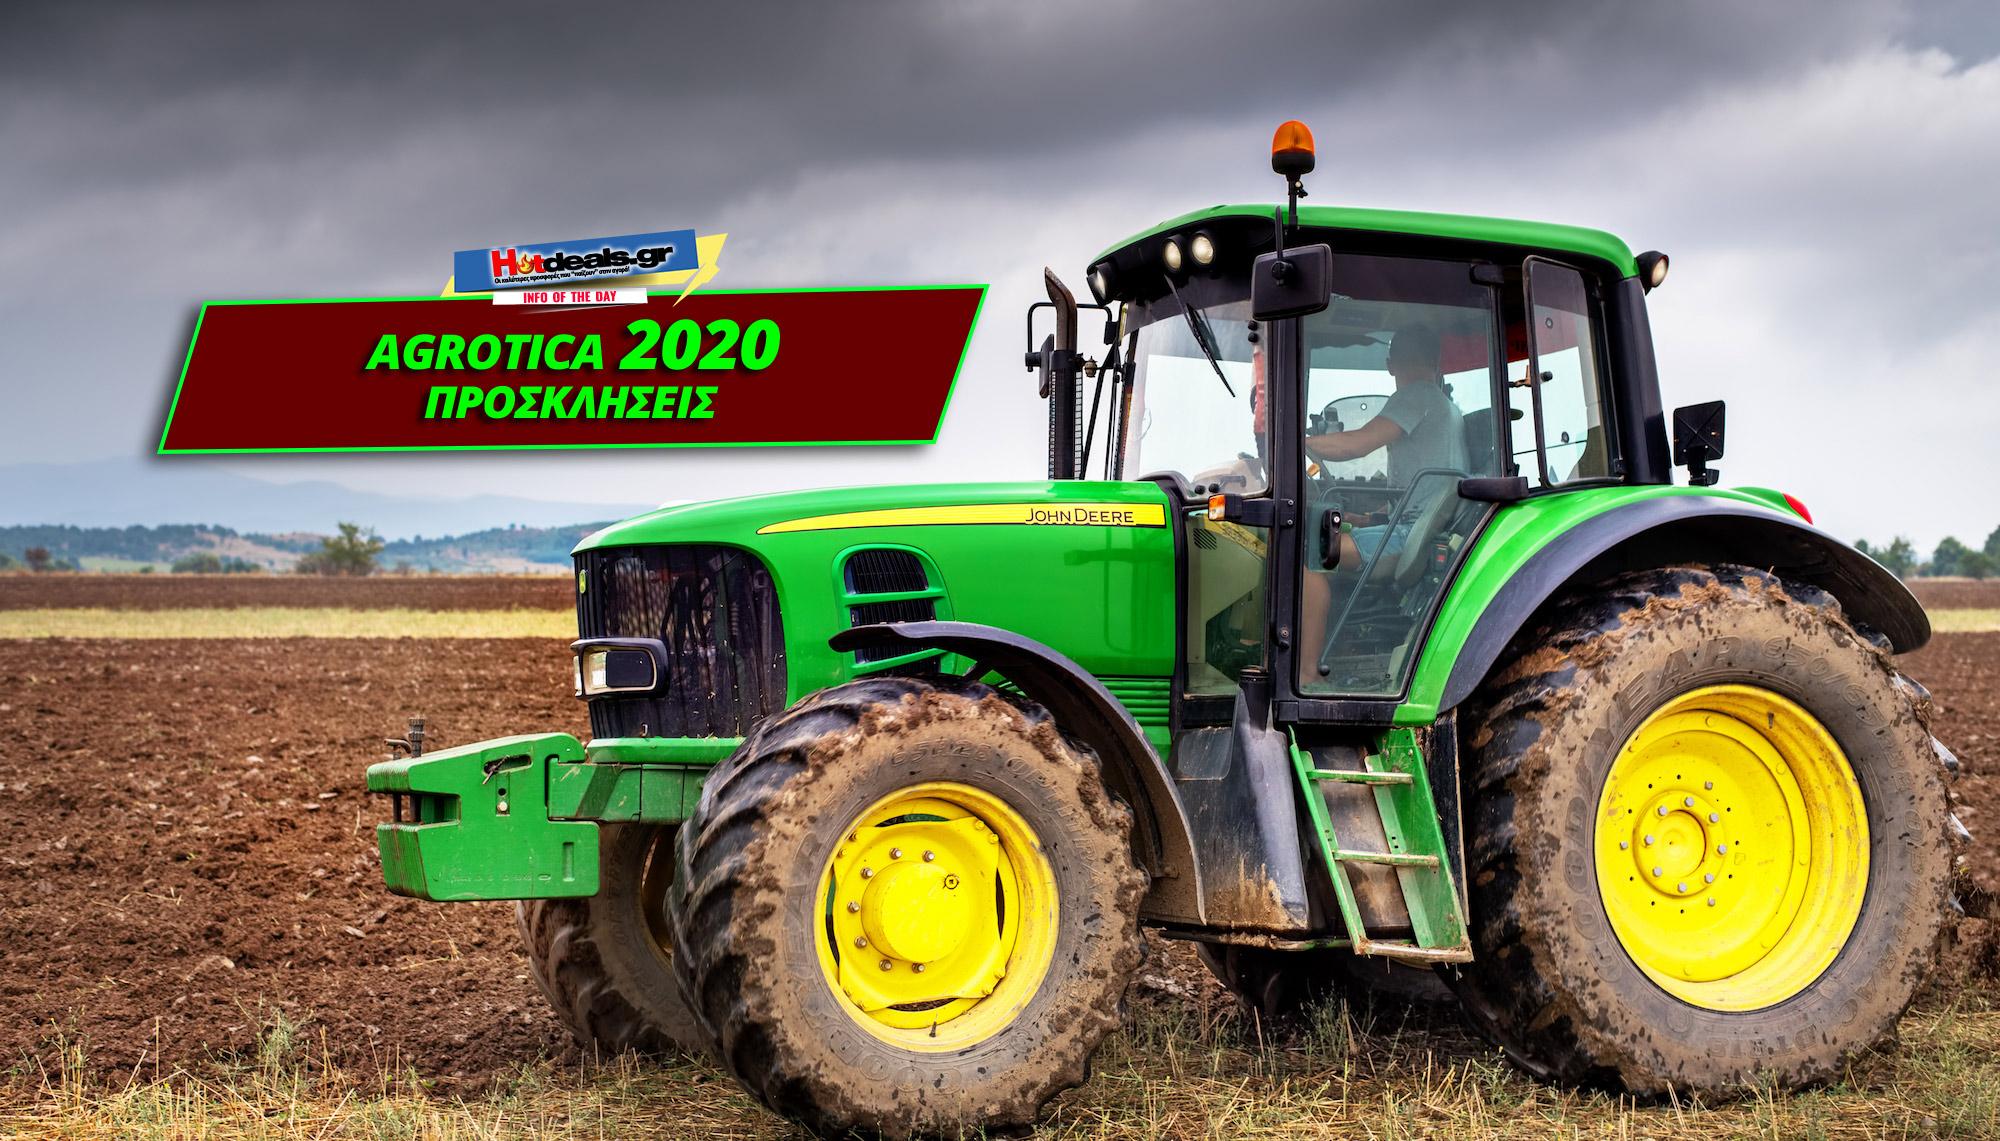 agrotica-2020-dvrean-prosklhseis-ekthesh-agrotica-eisithria-dorean-hotdealsgr-